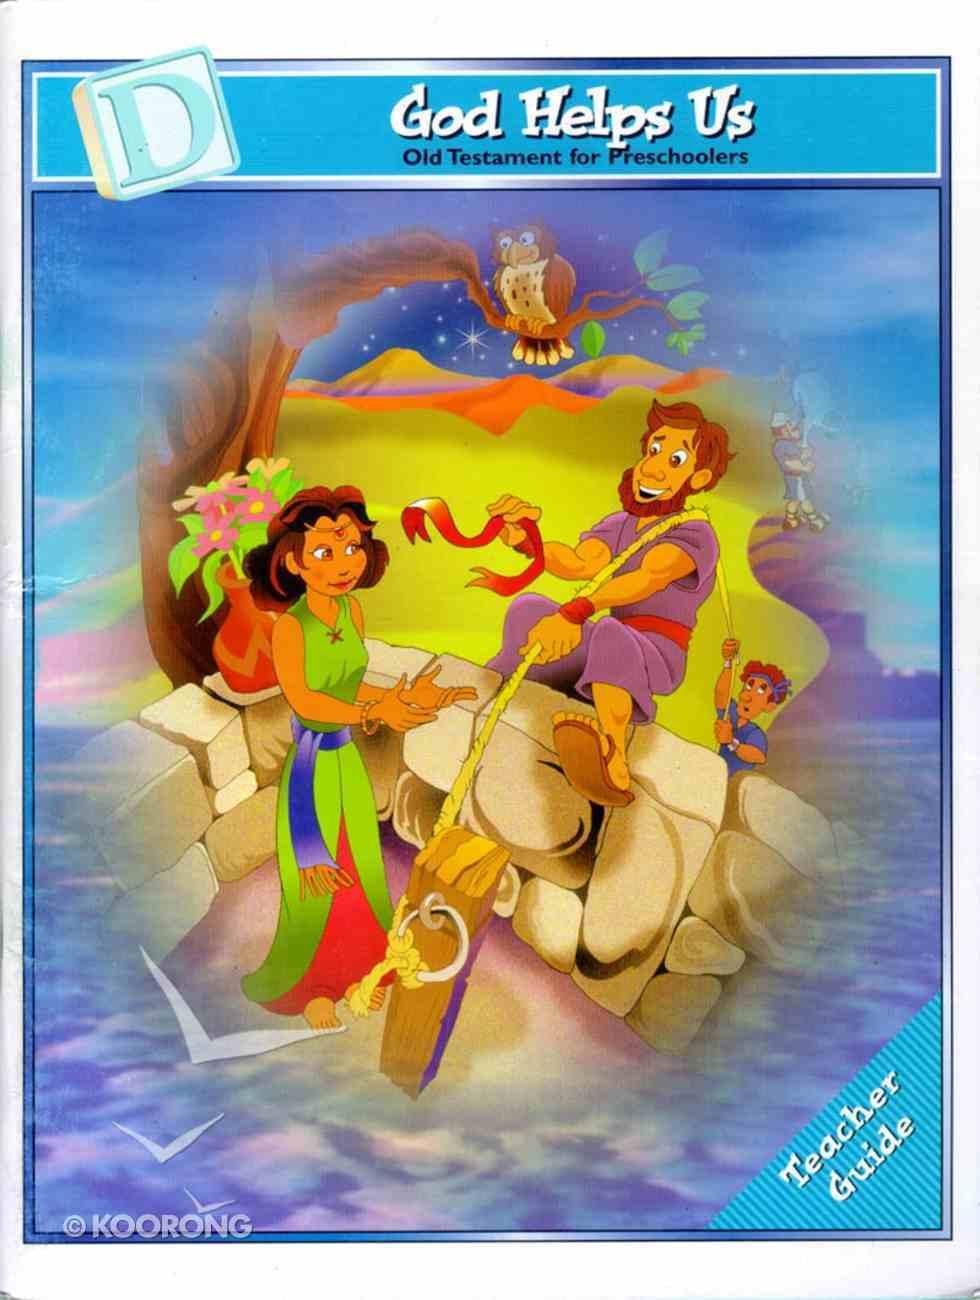 Dlc Preschool: OT, Unit D Ages 2-5 (Teacher) (Discipleland Preschool, Ages 3-5 Series) Paperback